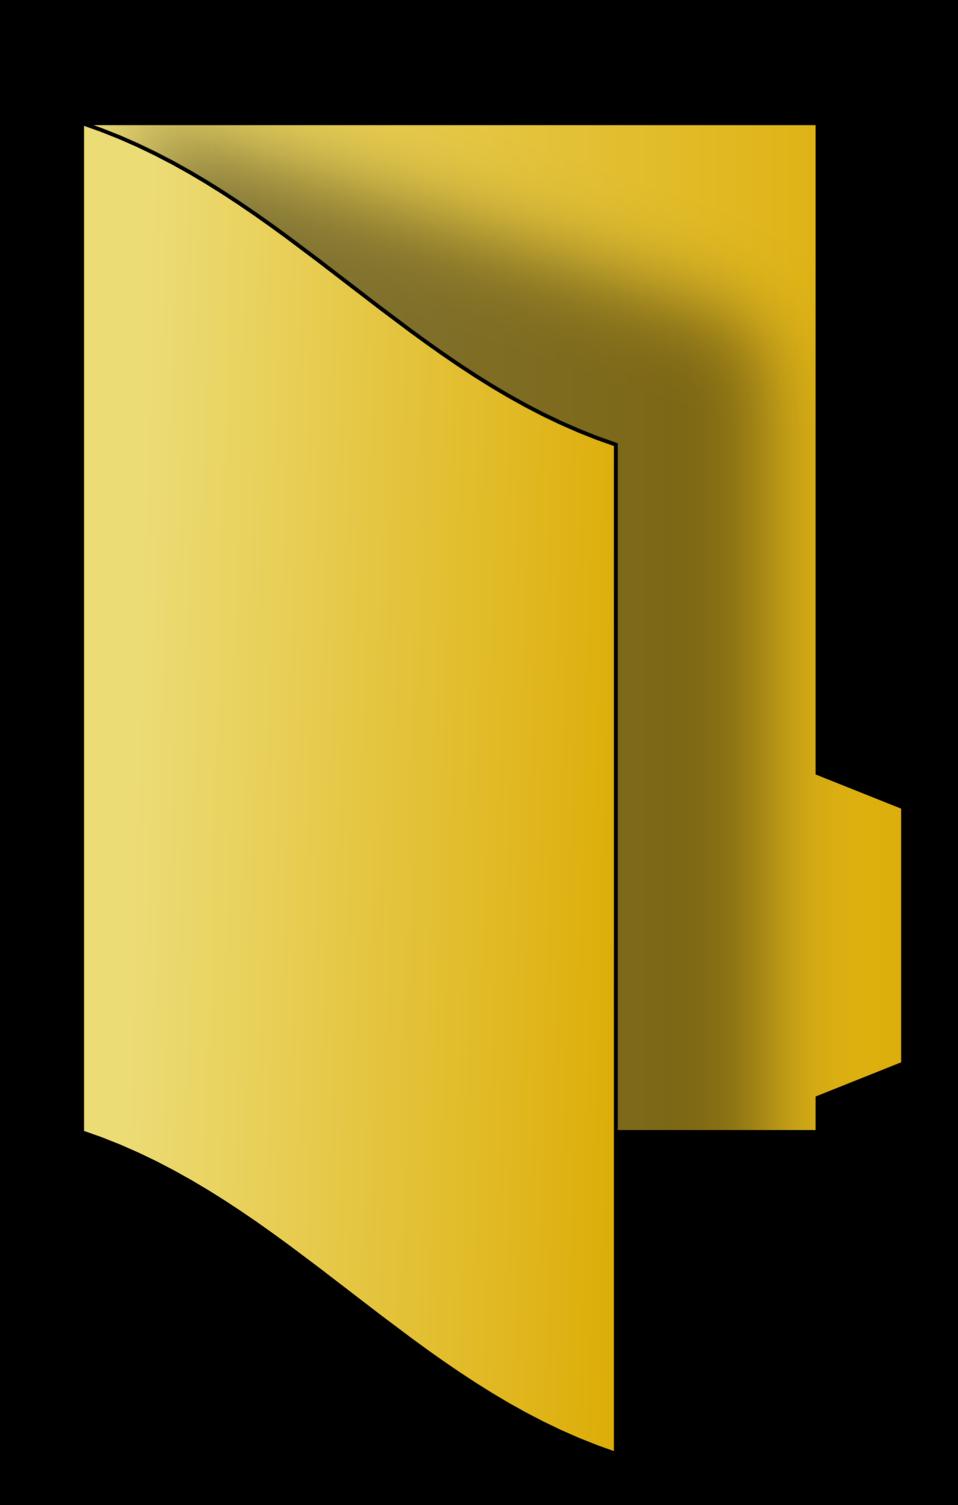 jpg library Public Domain Clip Art Image